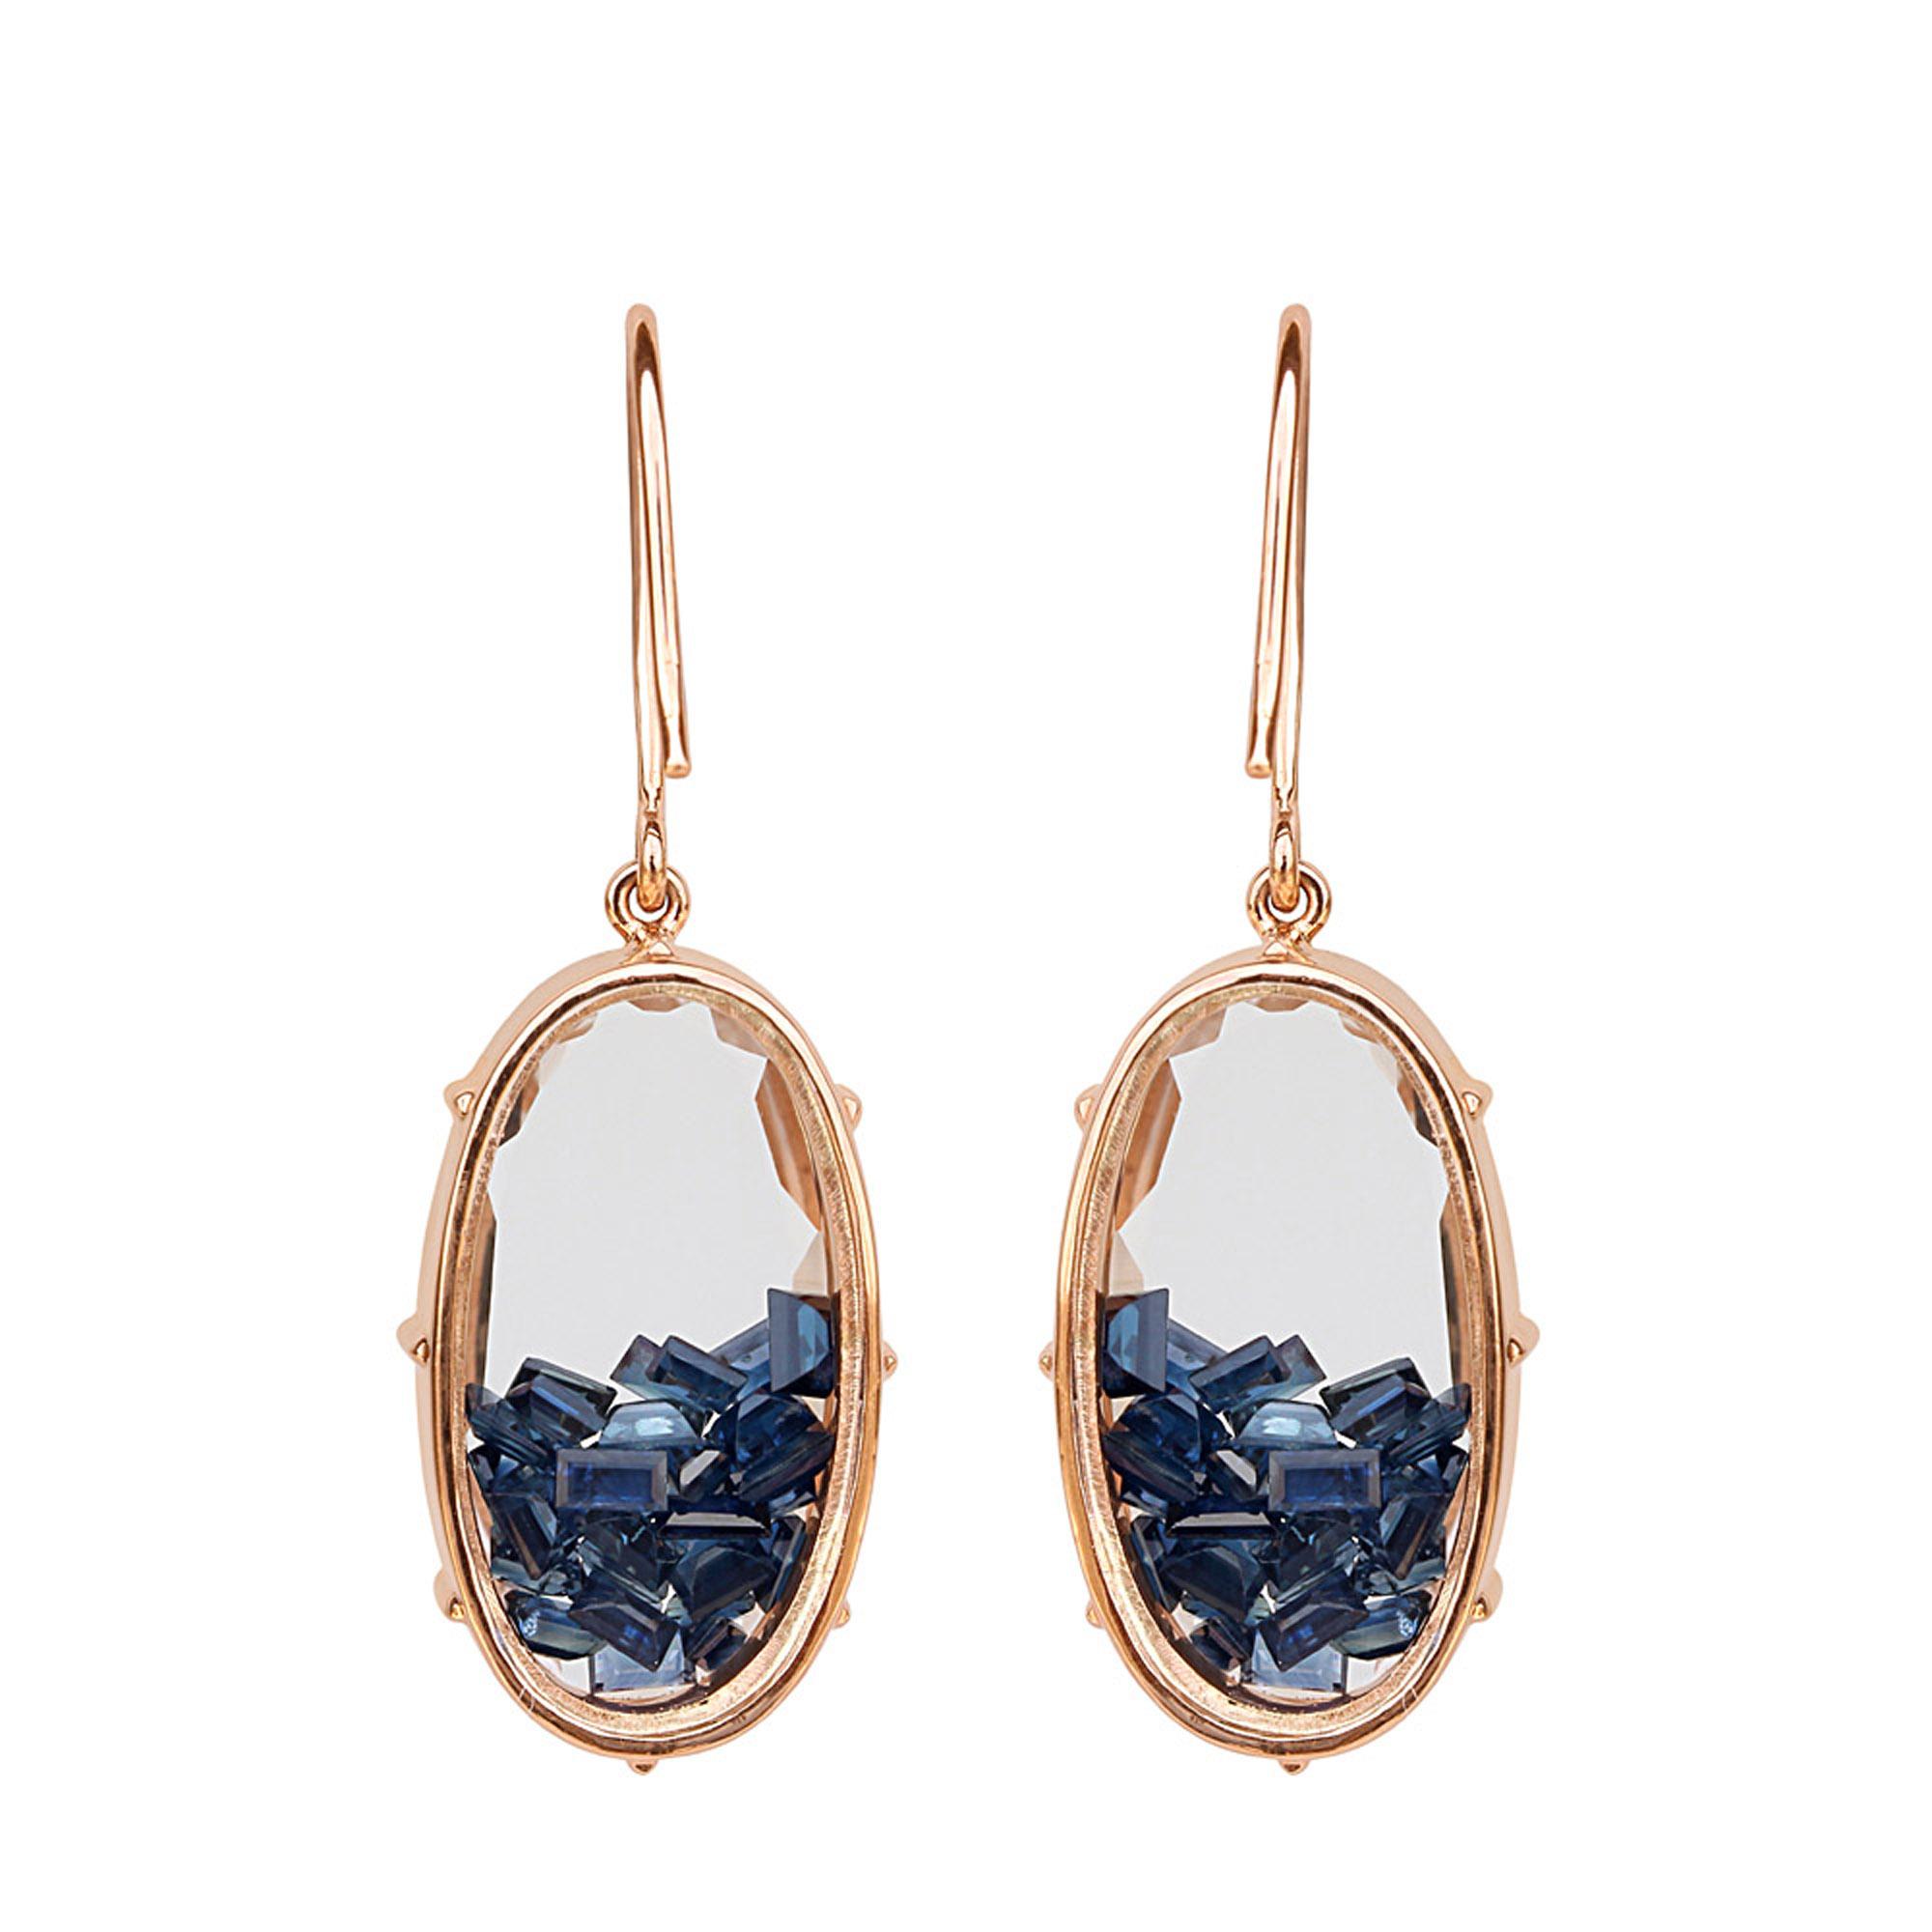 18k gold loose sapphire crystal shaker hook earrings